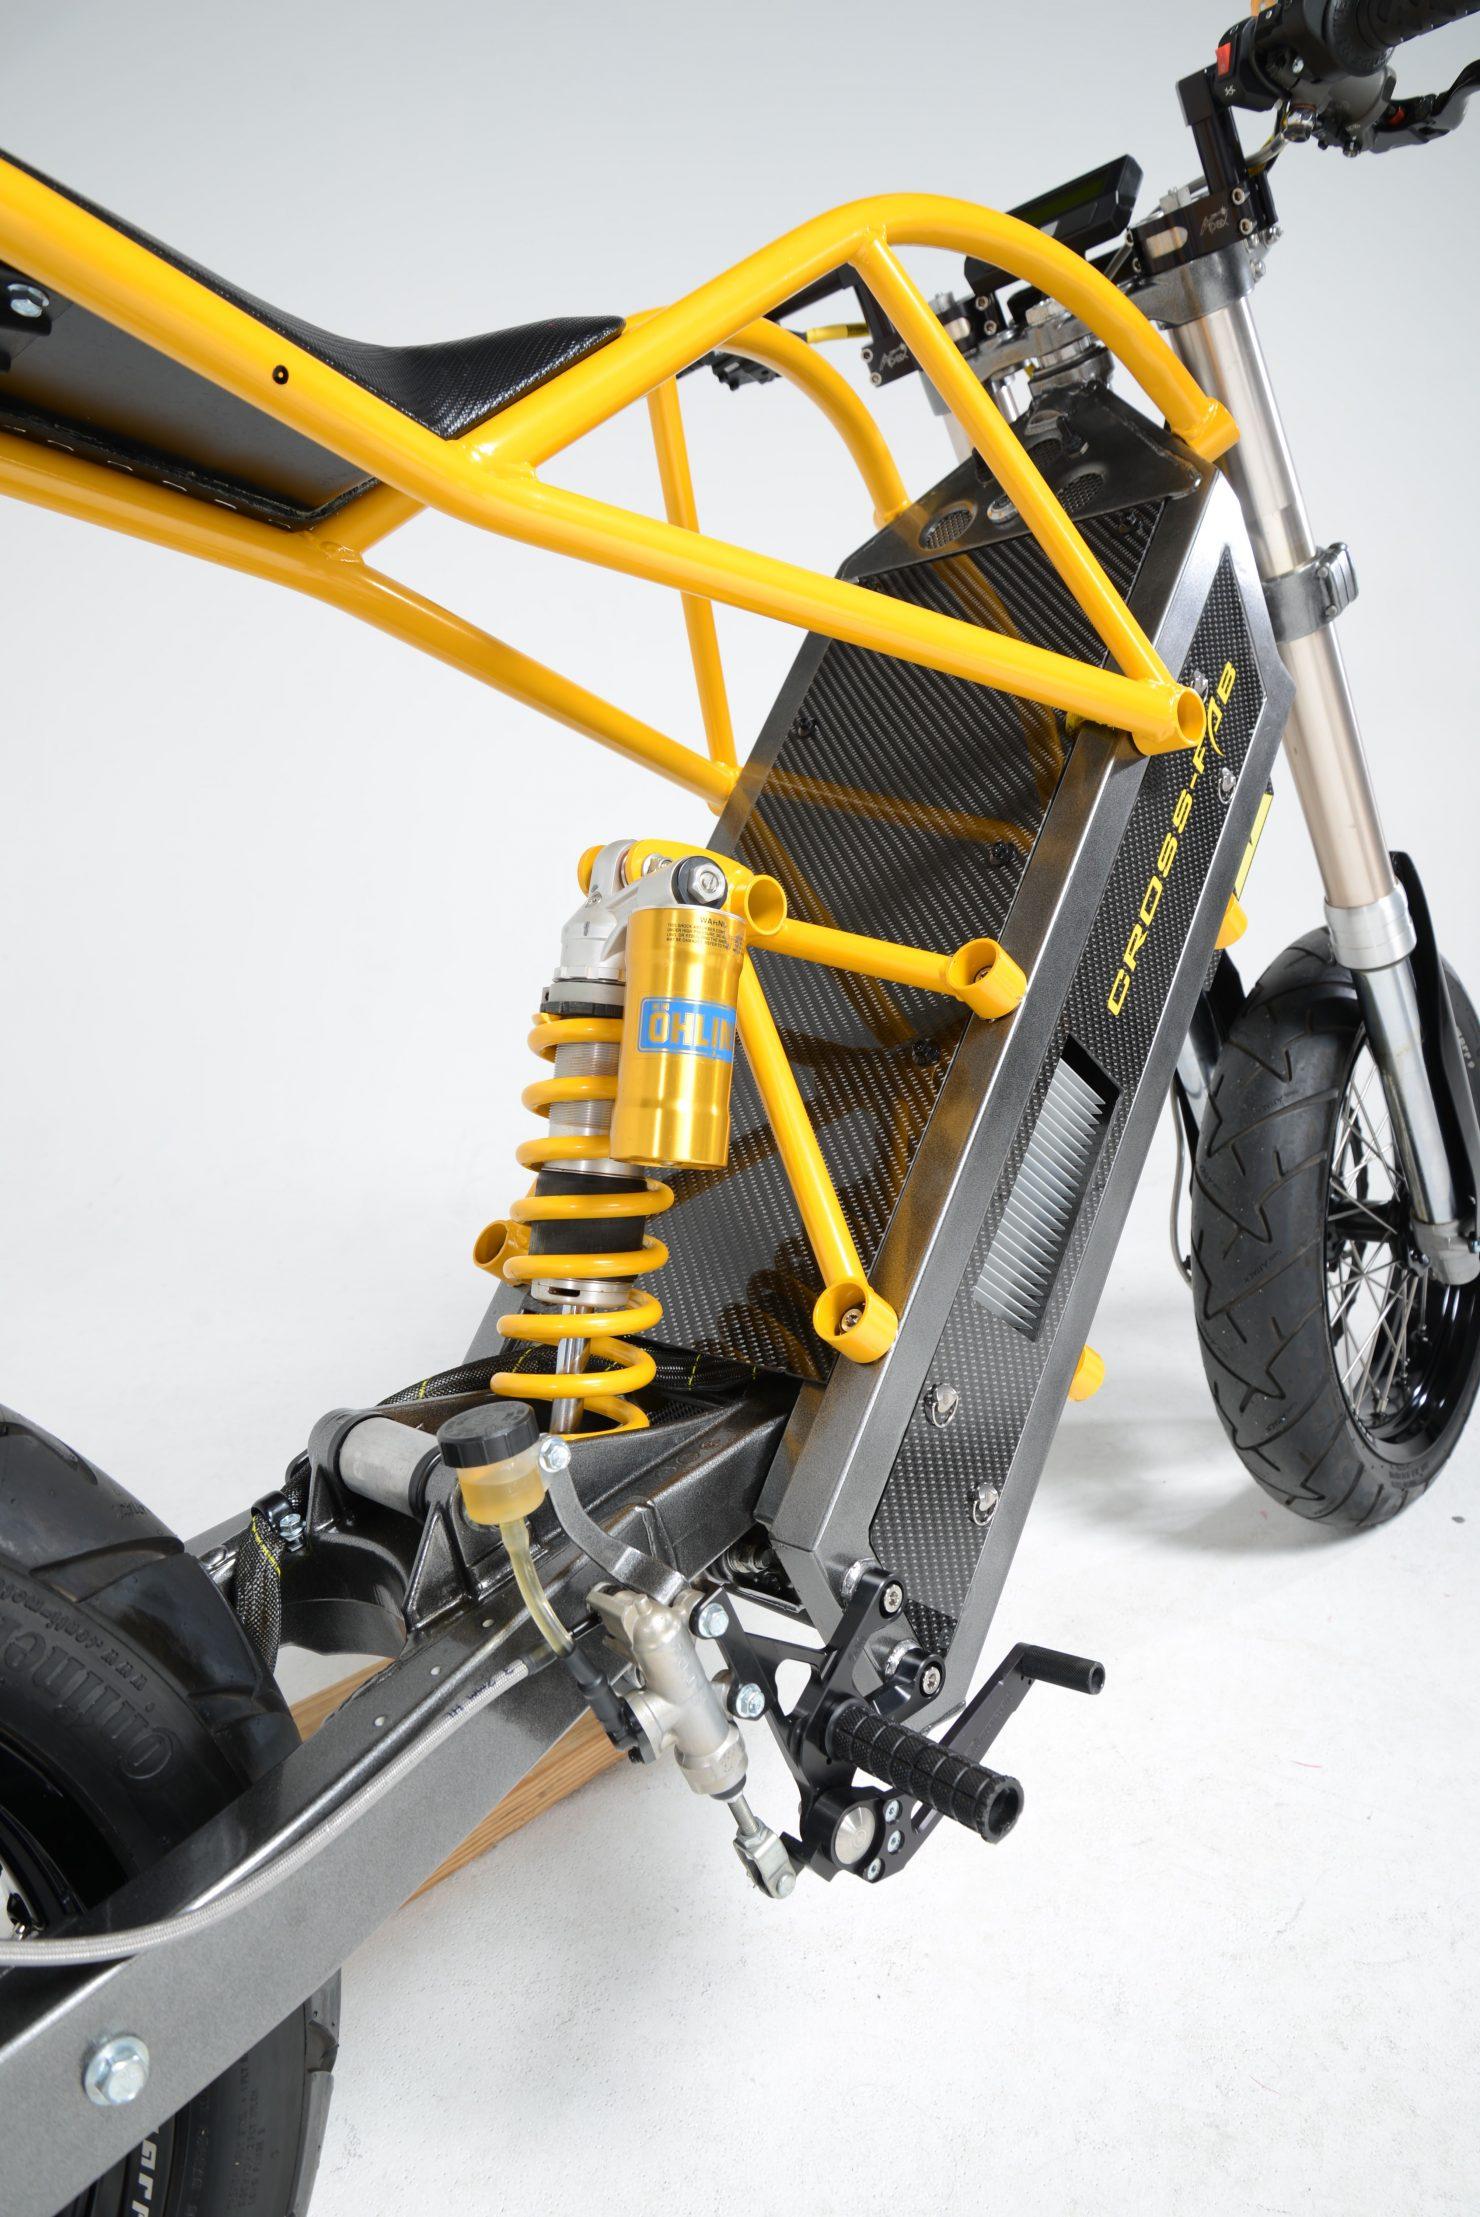 ExoDyne Electric Motorcycle 6 1480x2217 - ExoDyne Electric Motorcycle